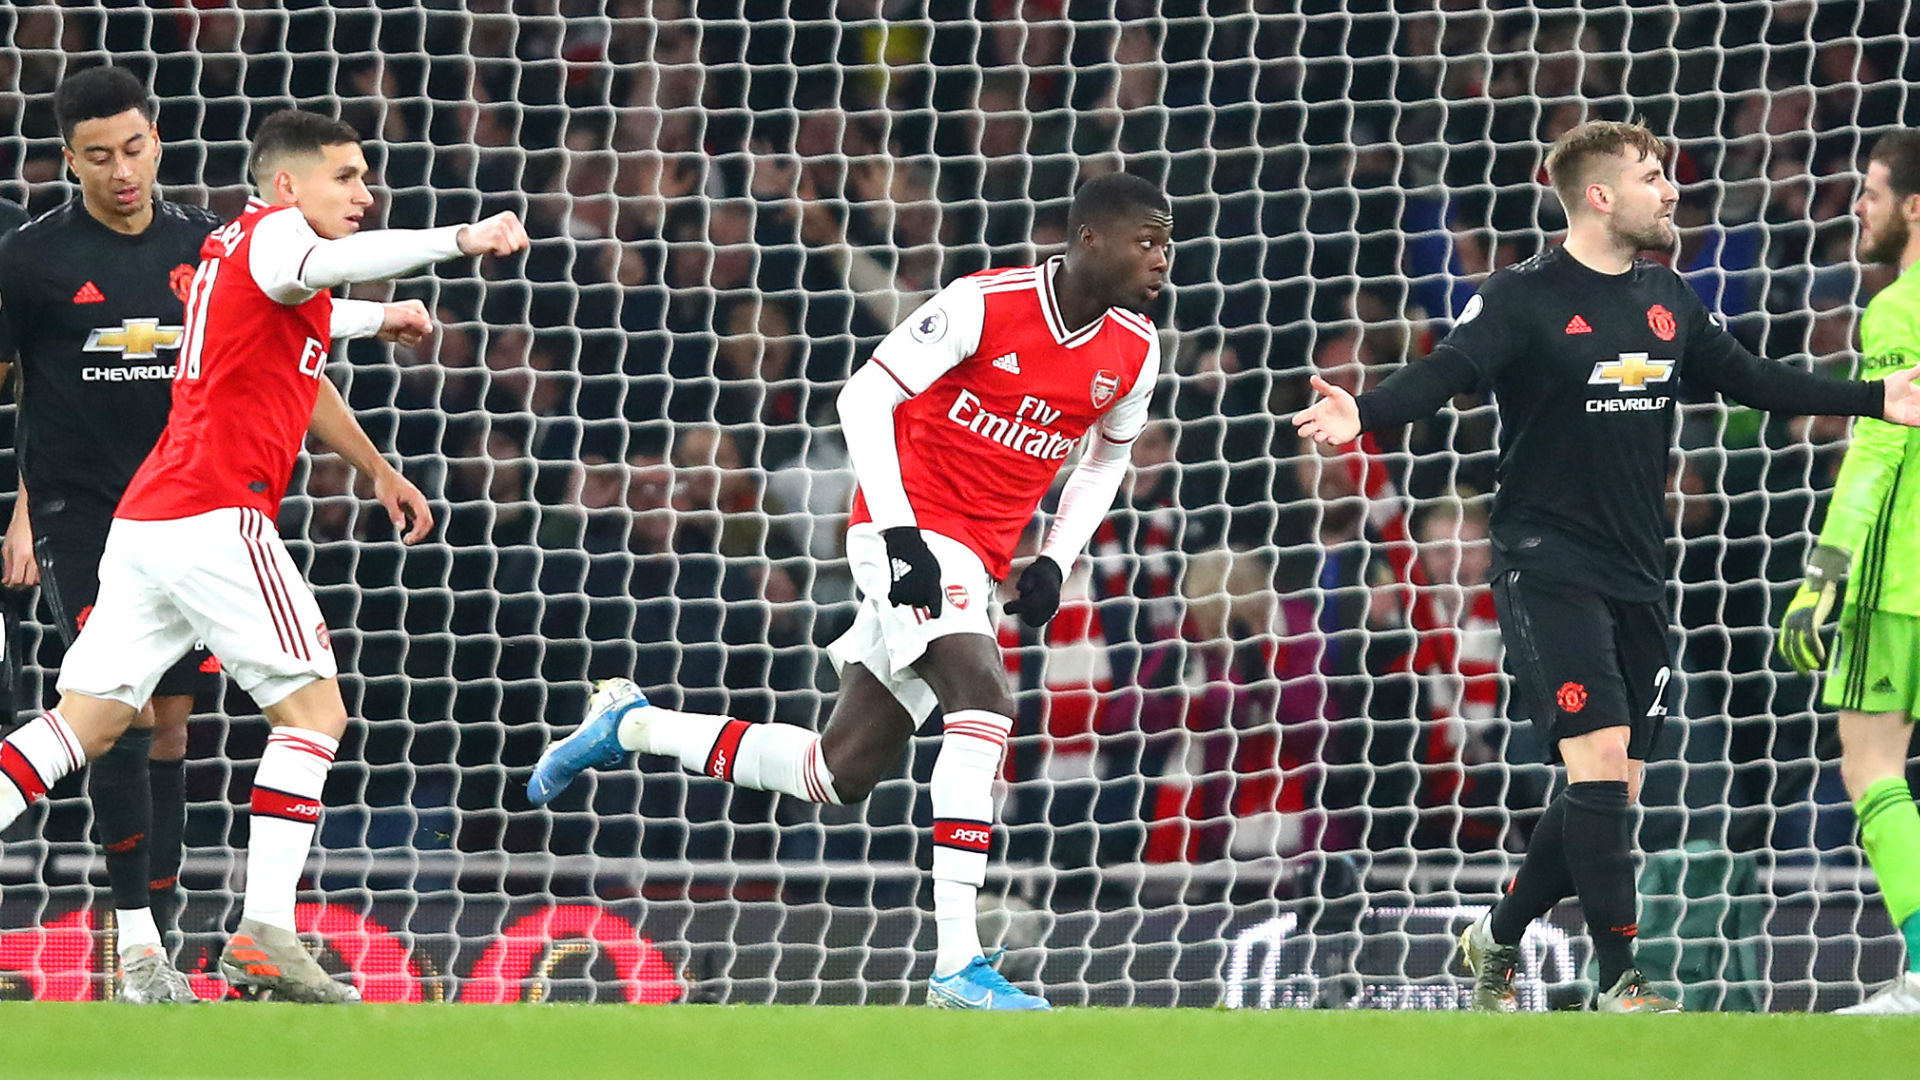 Pepe Arsenal Manchester United 2020